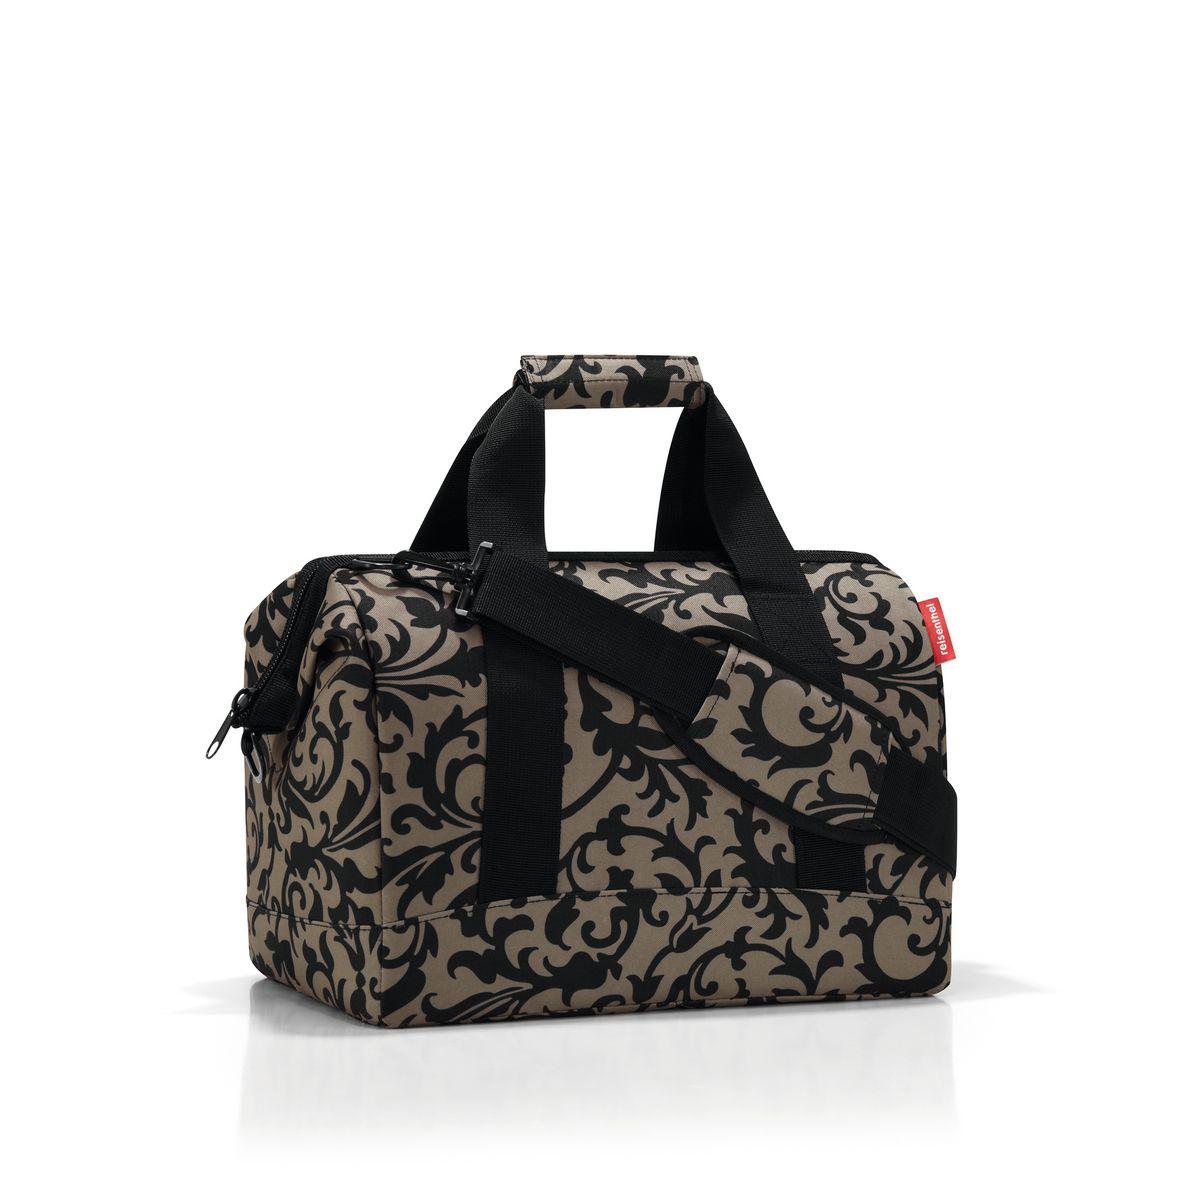 Сумка женская Reisenthel, цвет: бежевый, черный. MS7027 сумка женская reisenthel цвет бежевый черный ms7027